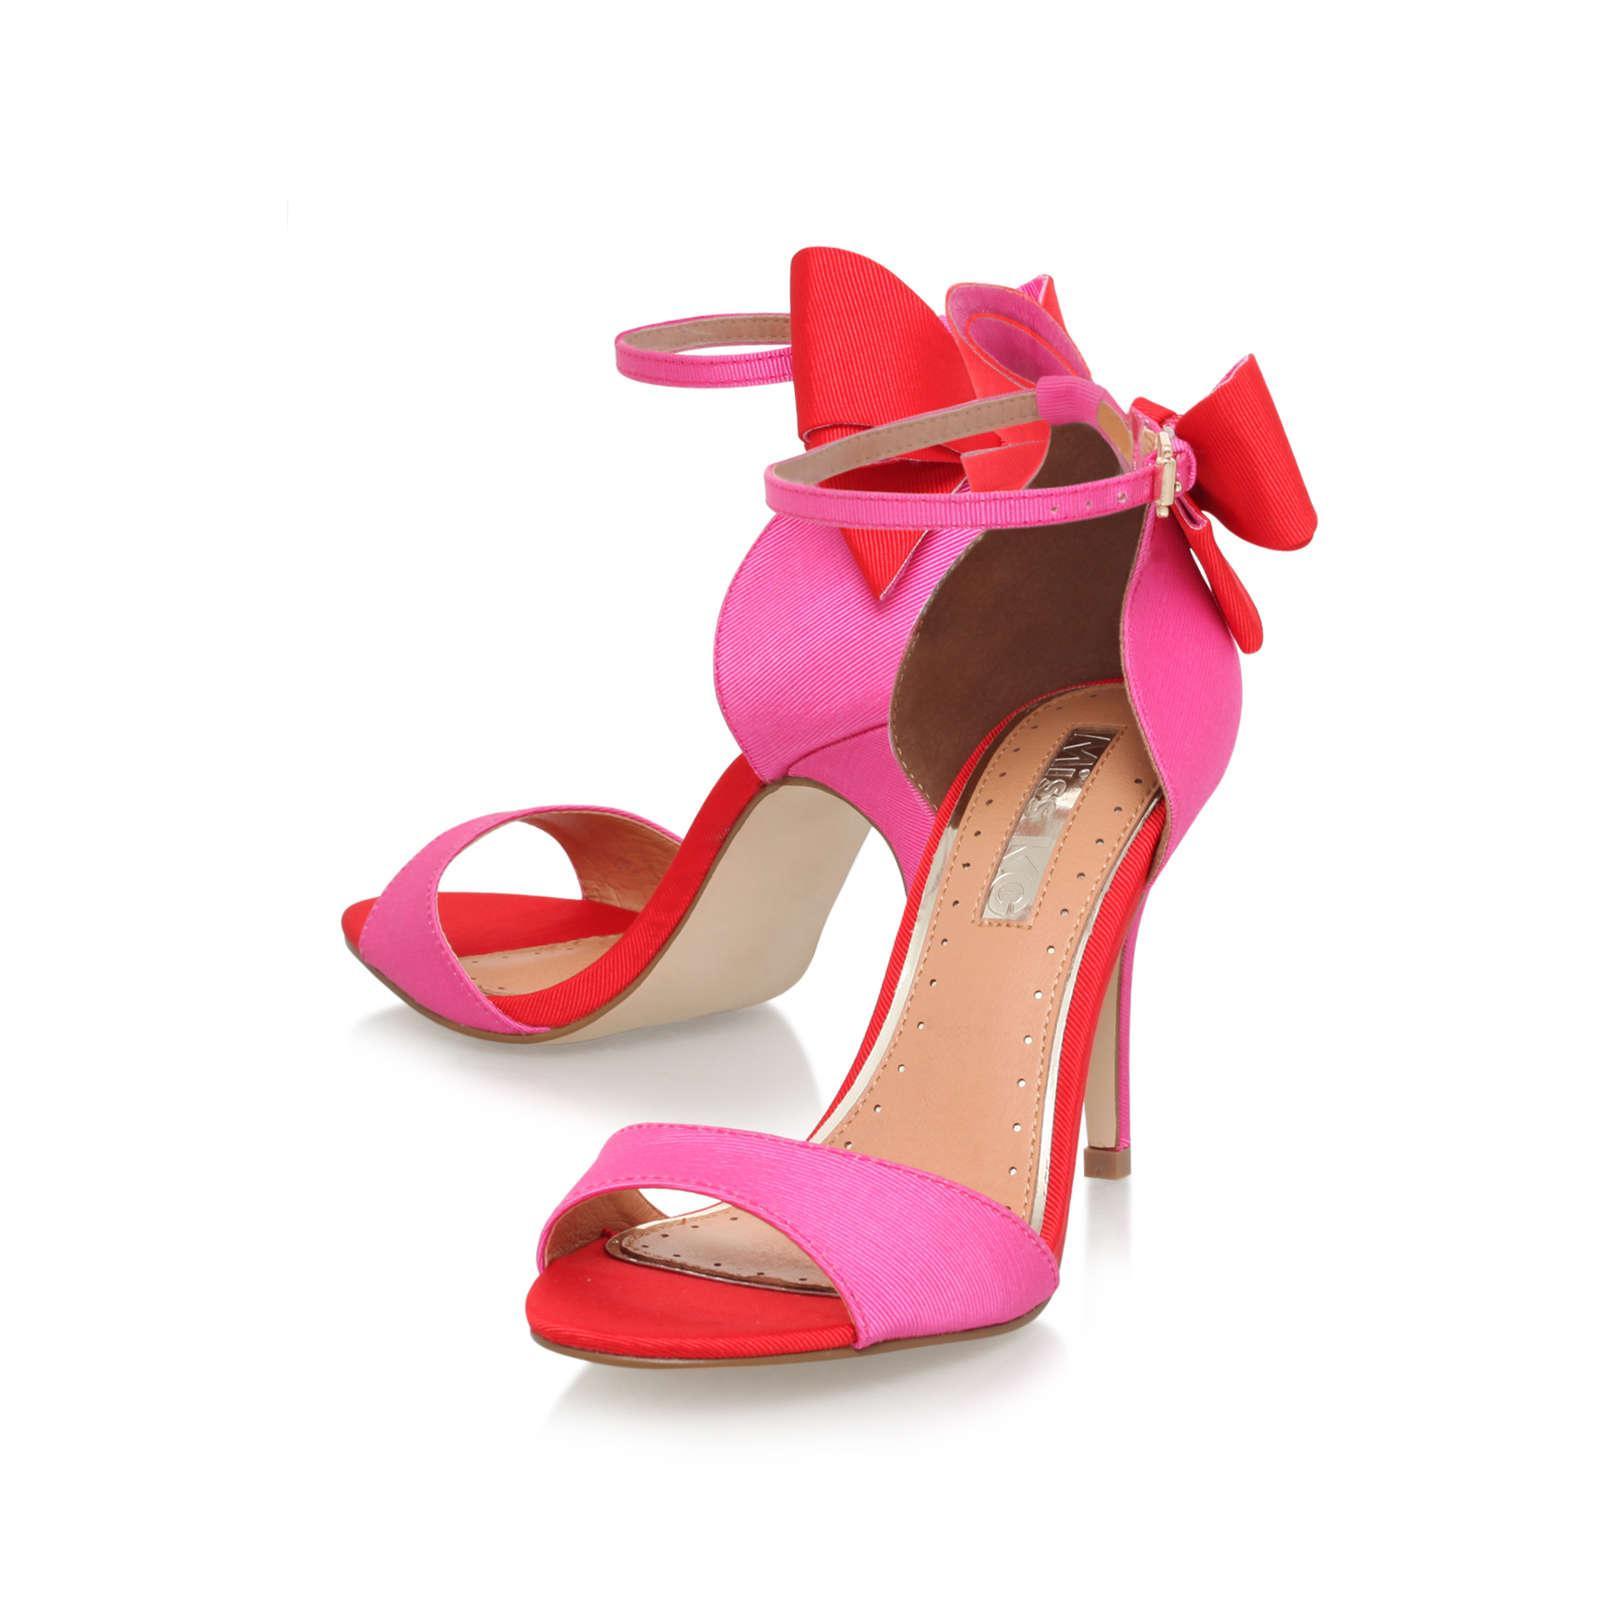 Lyst - Miss Kg Faleece Embellished Heeled Sandals in Metallic